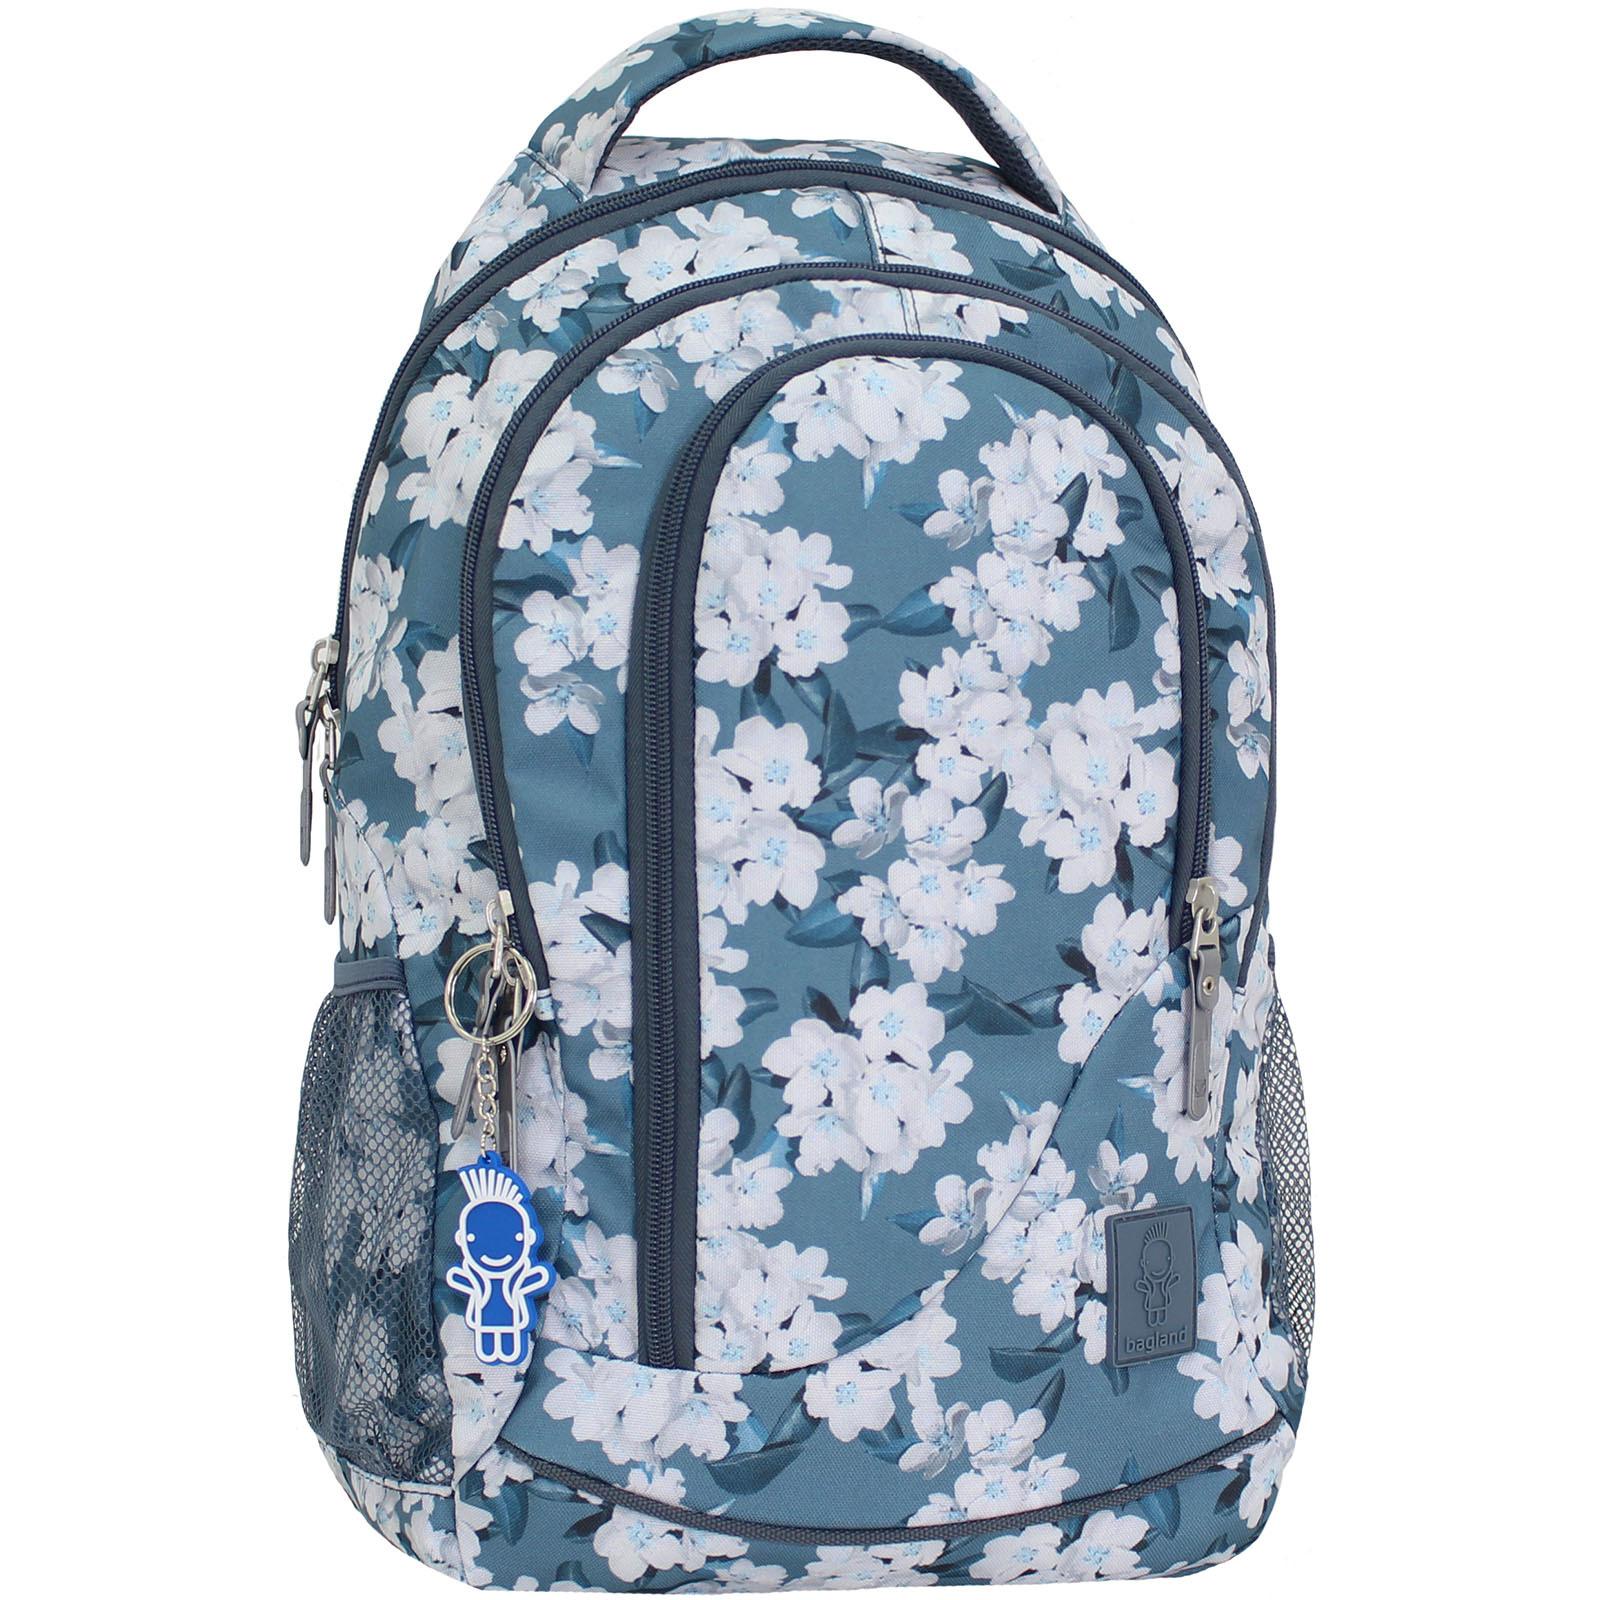 Городские рюкзаки Рюкзак Bagland Бис 19 л. сублімація 161 (00556664) IMG_9675.JPG